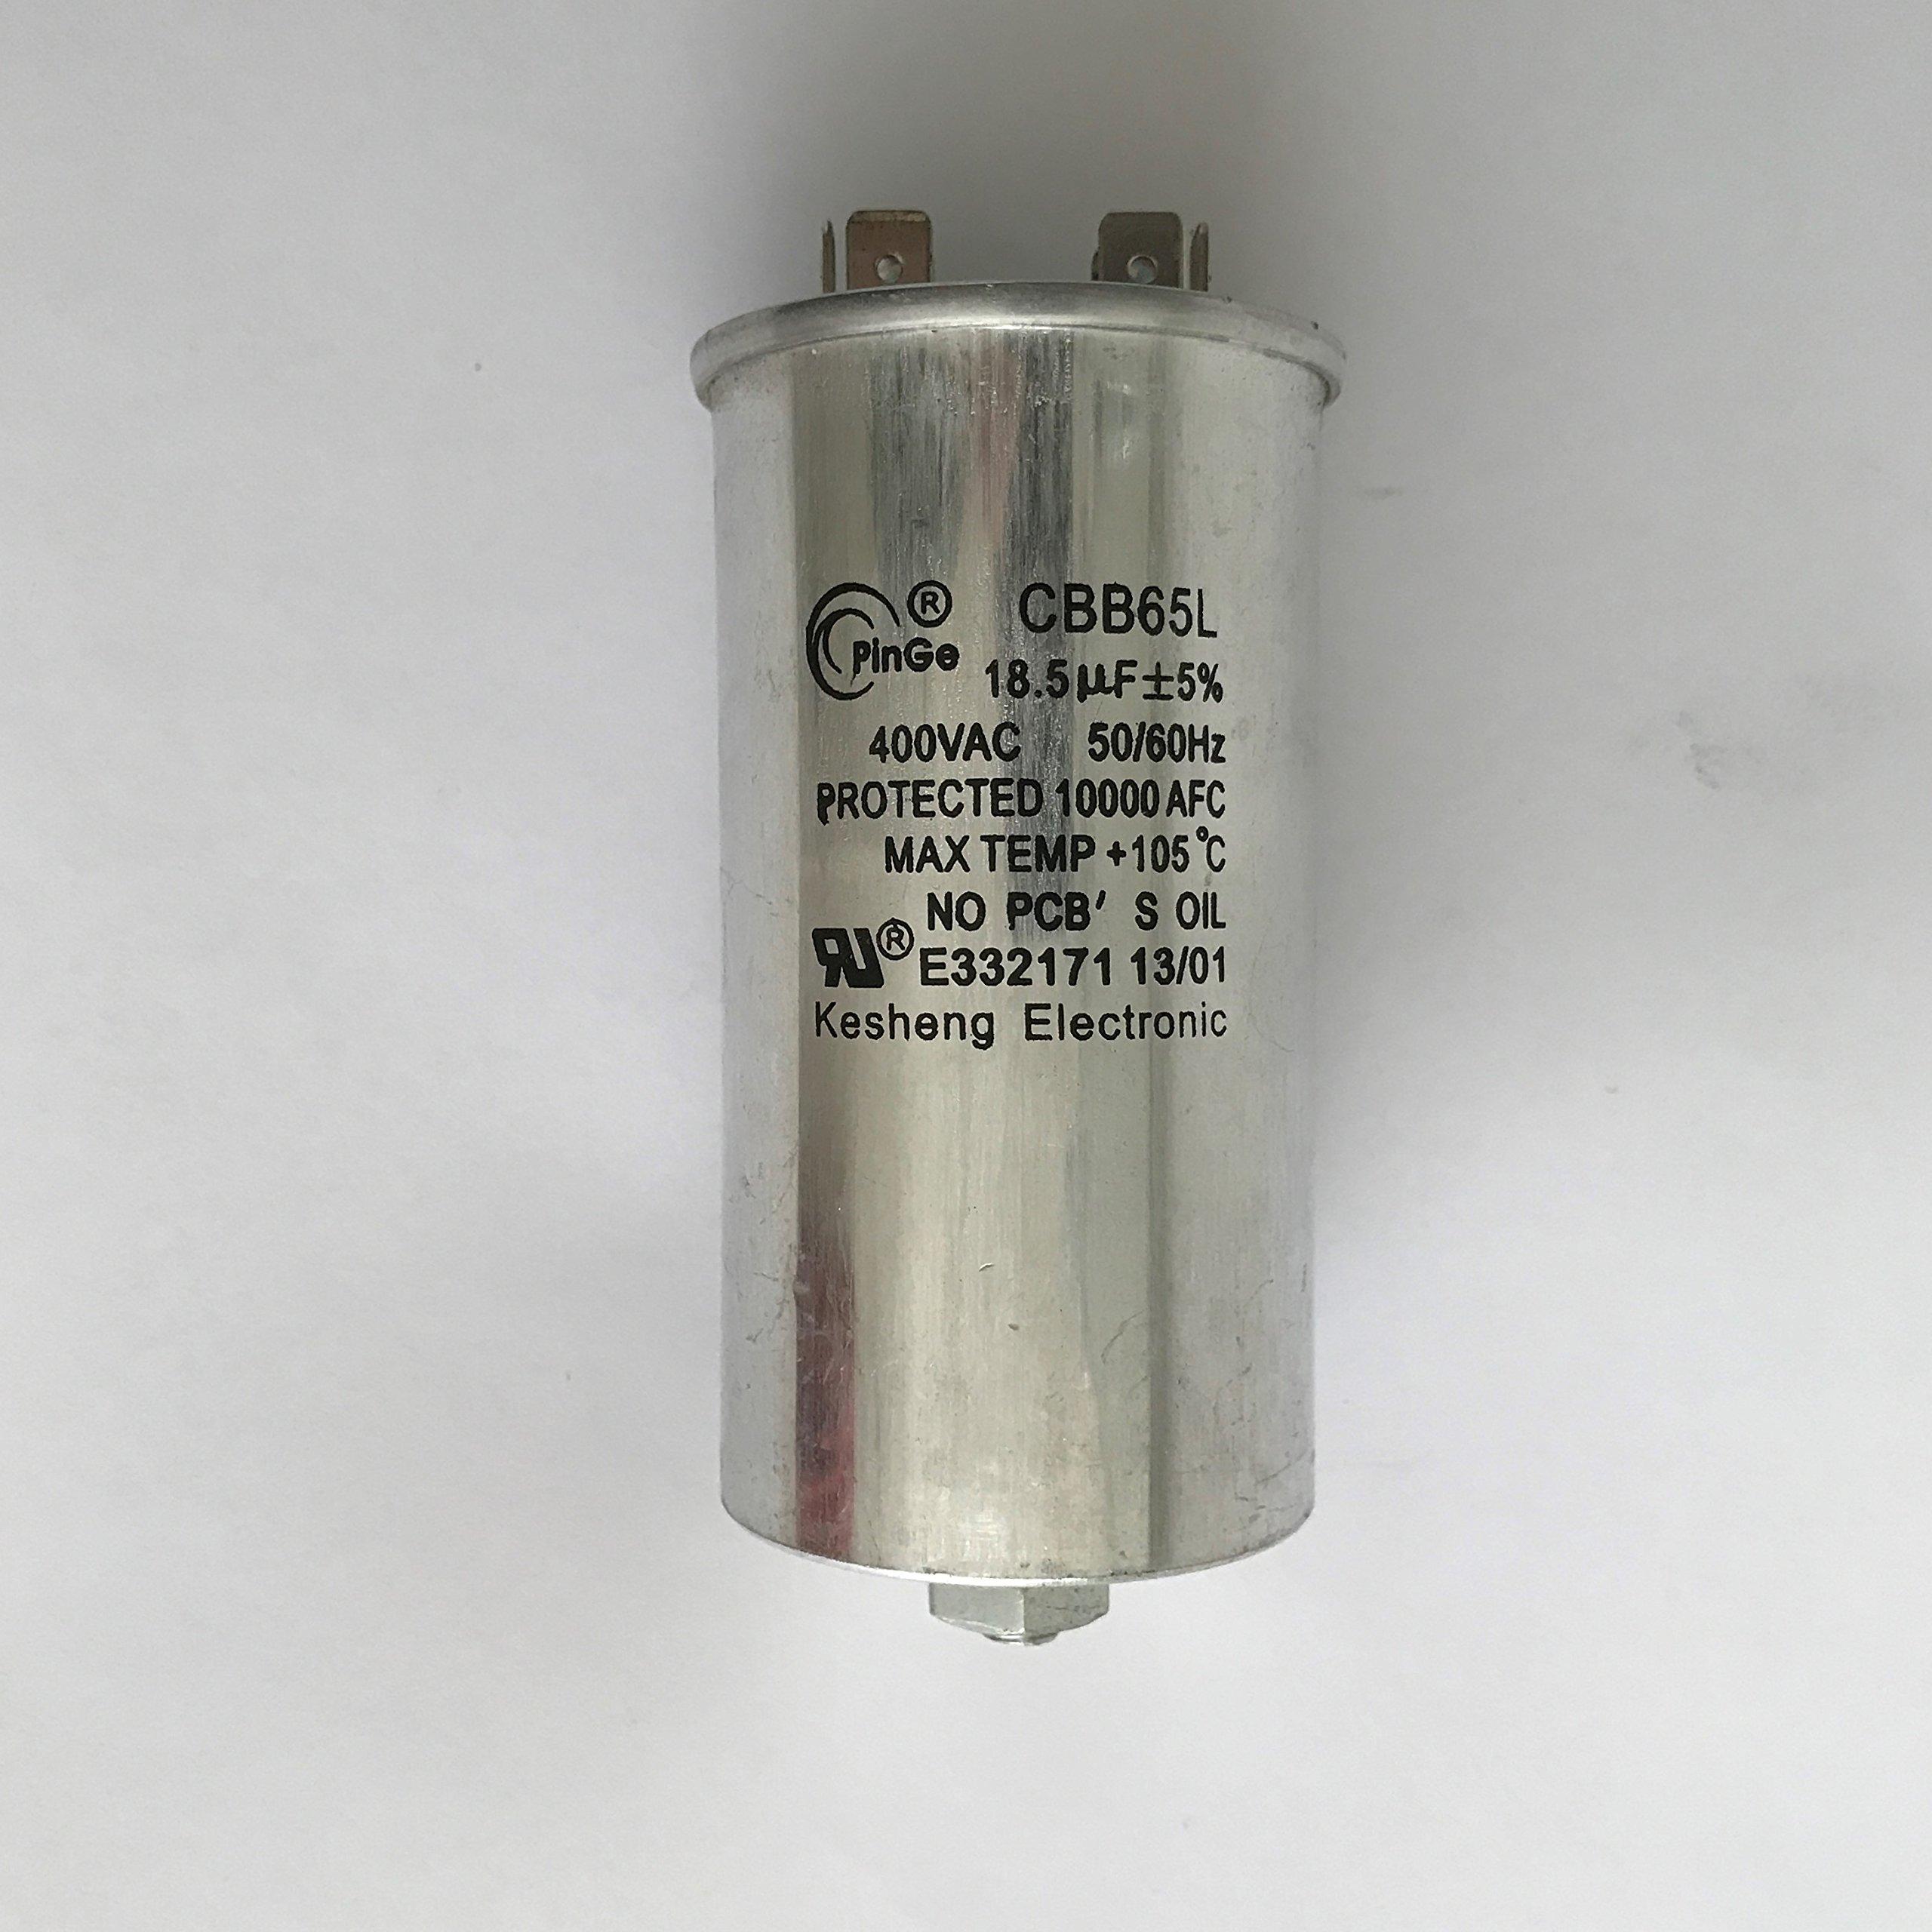 Capacitor 18.5uF/400VAC 120-480 Volt for Metal Halide 250 Watt-PS (1 Piece)